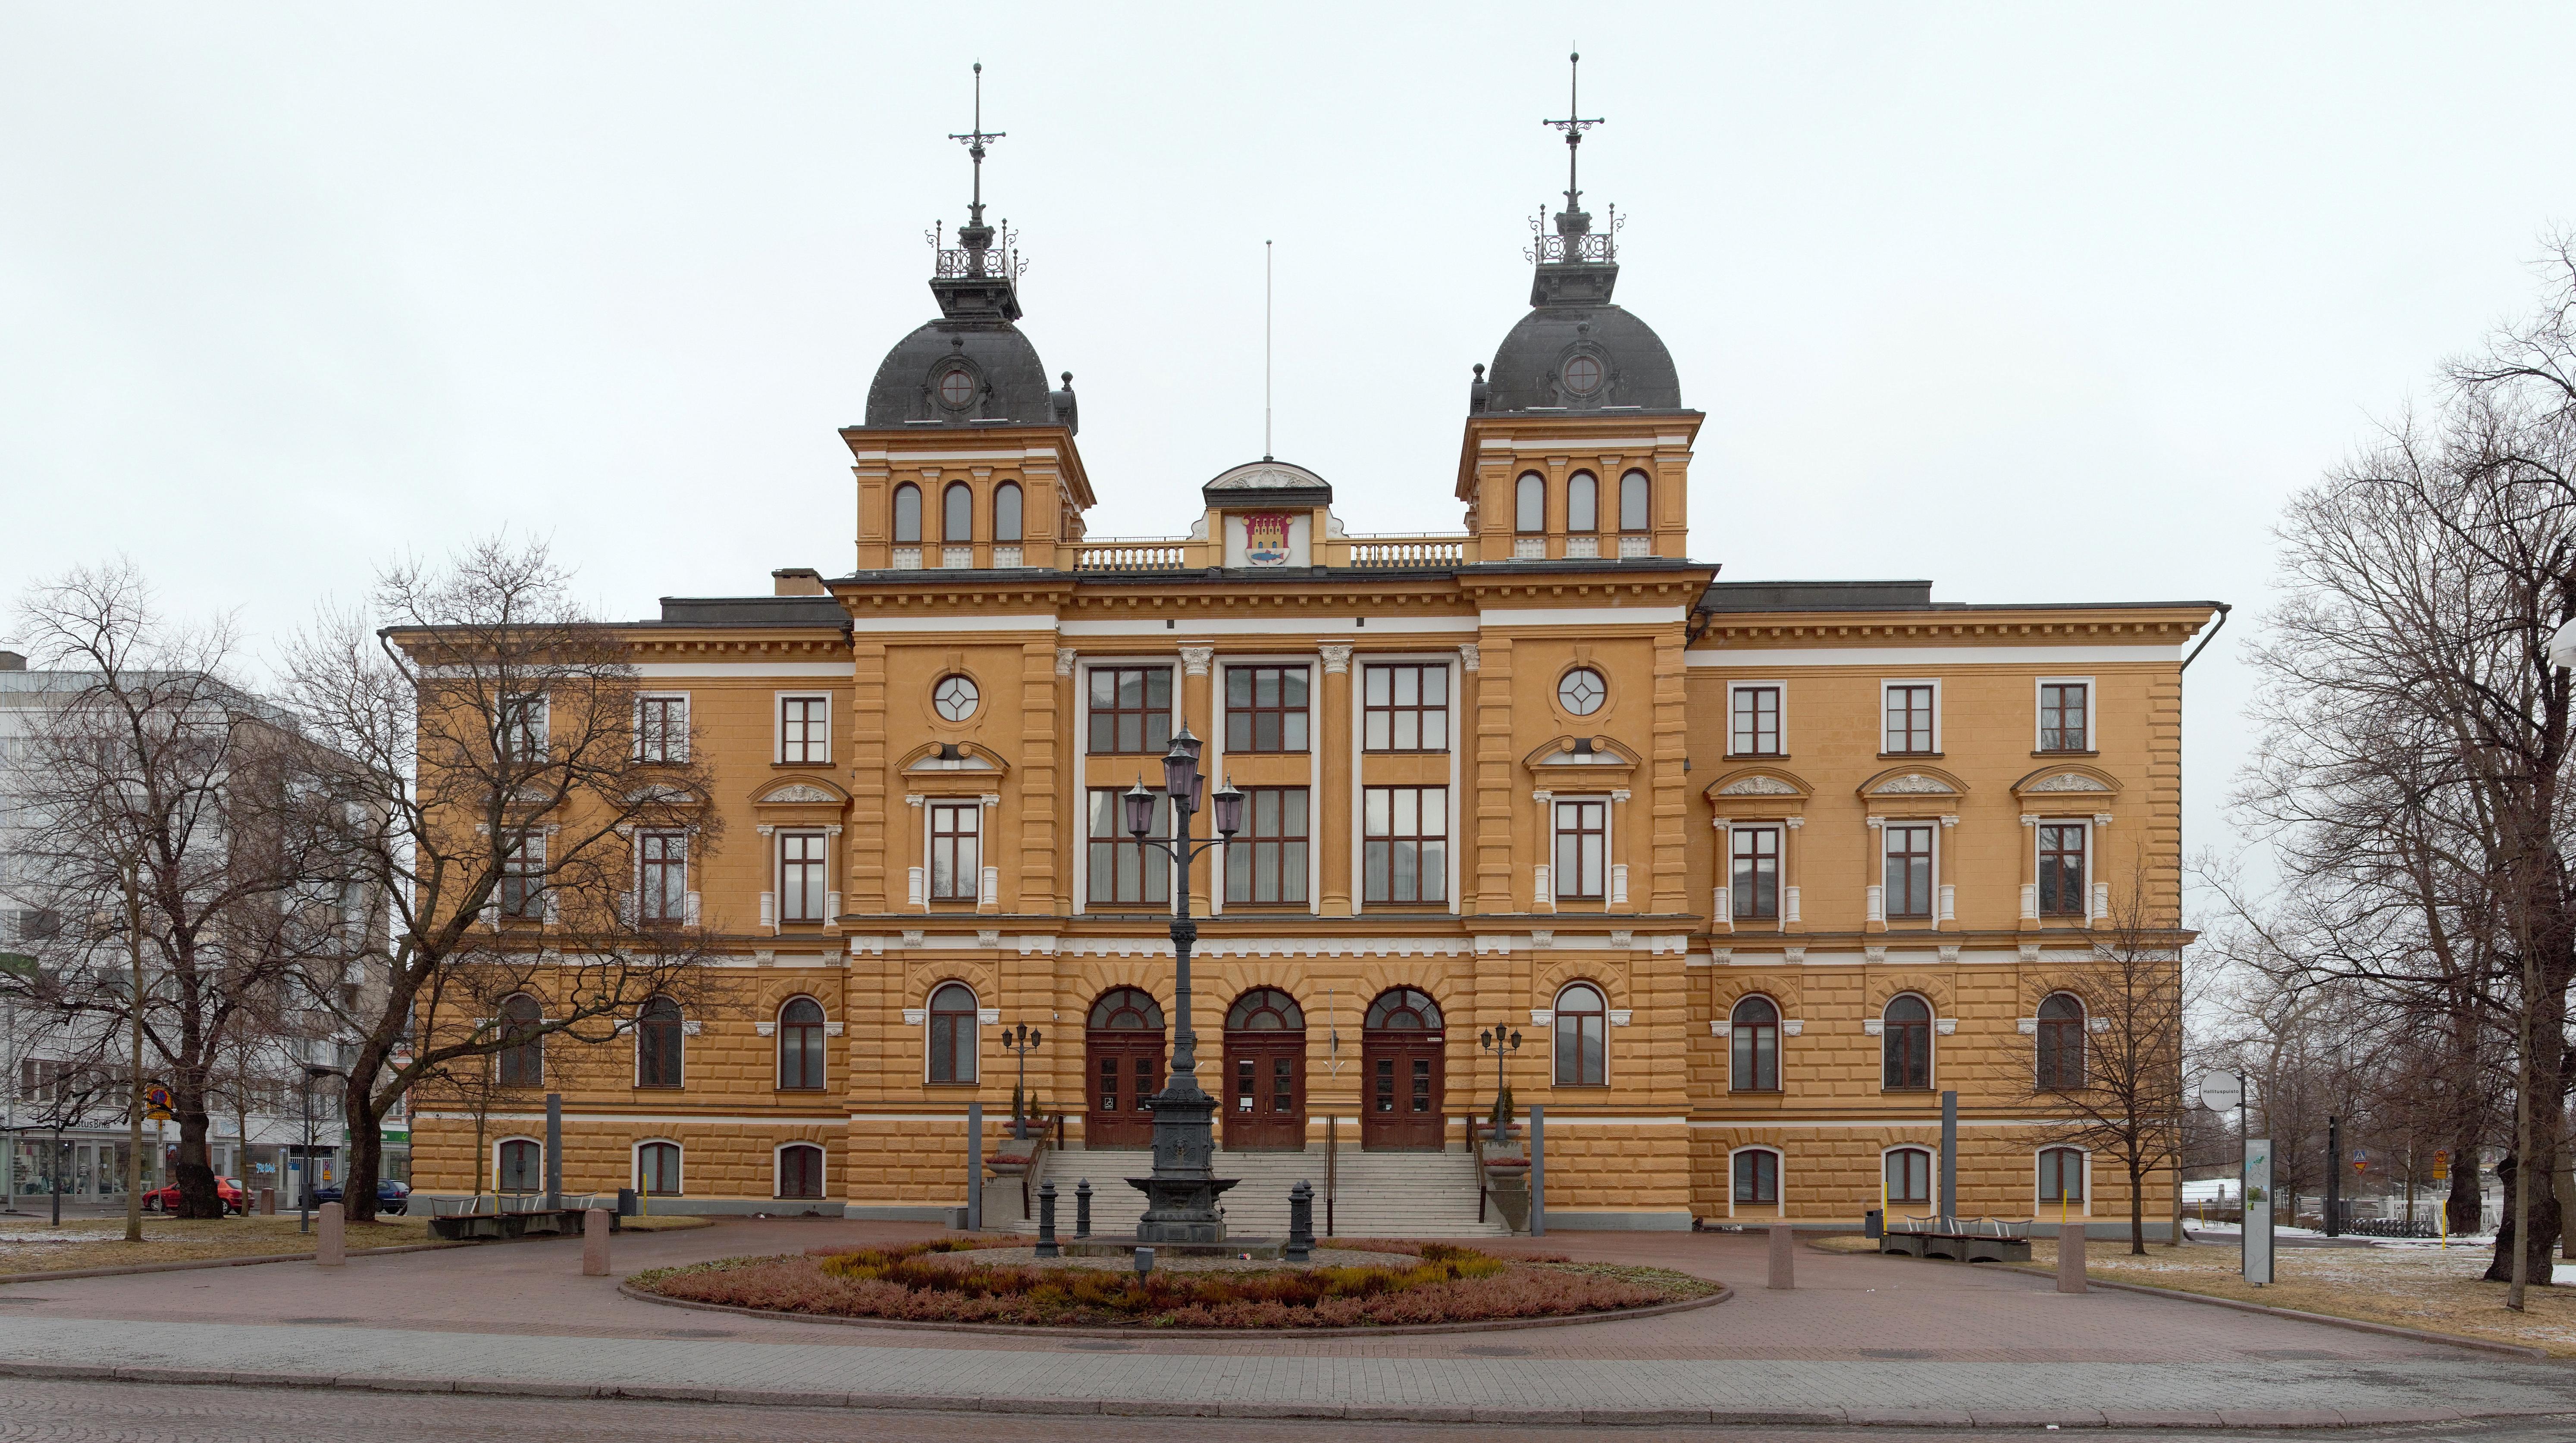 https://upload.wikimedia.org/wikipedia/commons/5/5d/Oulu_City_Hall_20150403.jpg